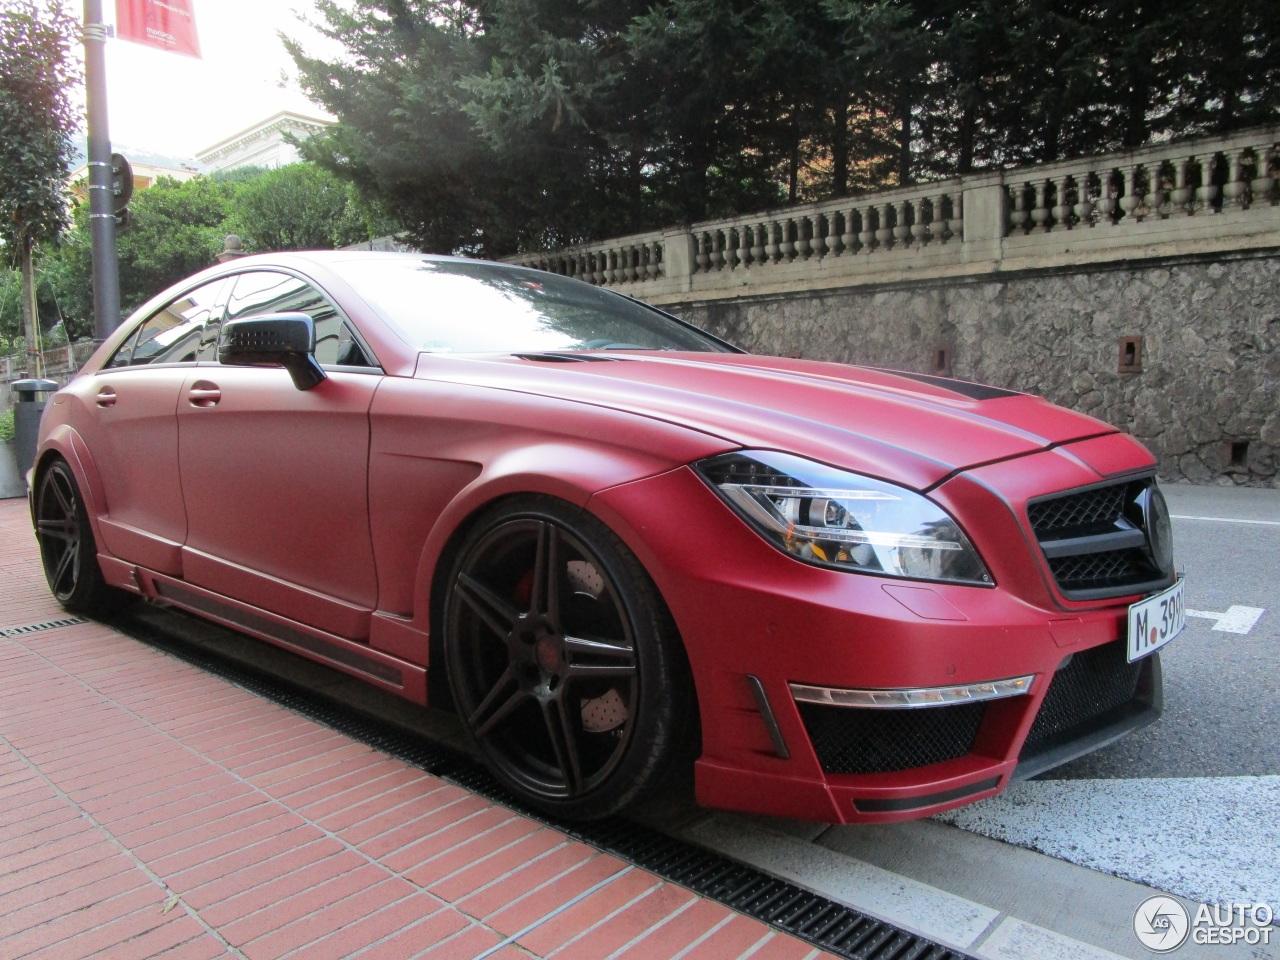 Mercedes benz cls 63 amg c218 stealth gsc 21 augustus for Mercedes benz cls 63 amg coupe